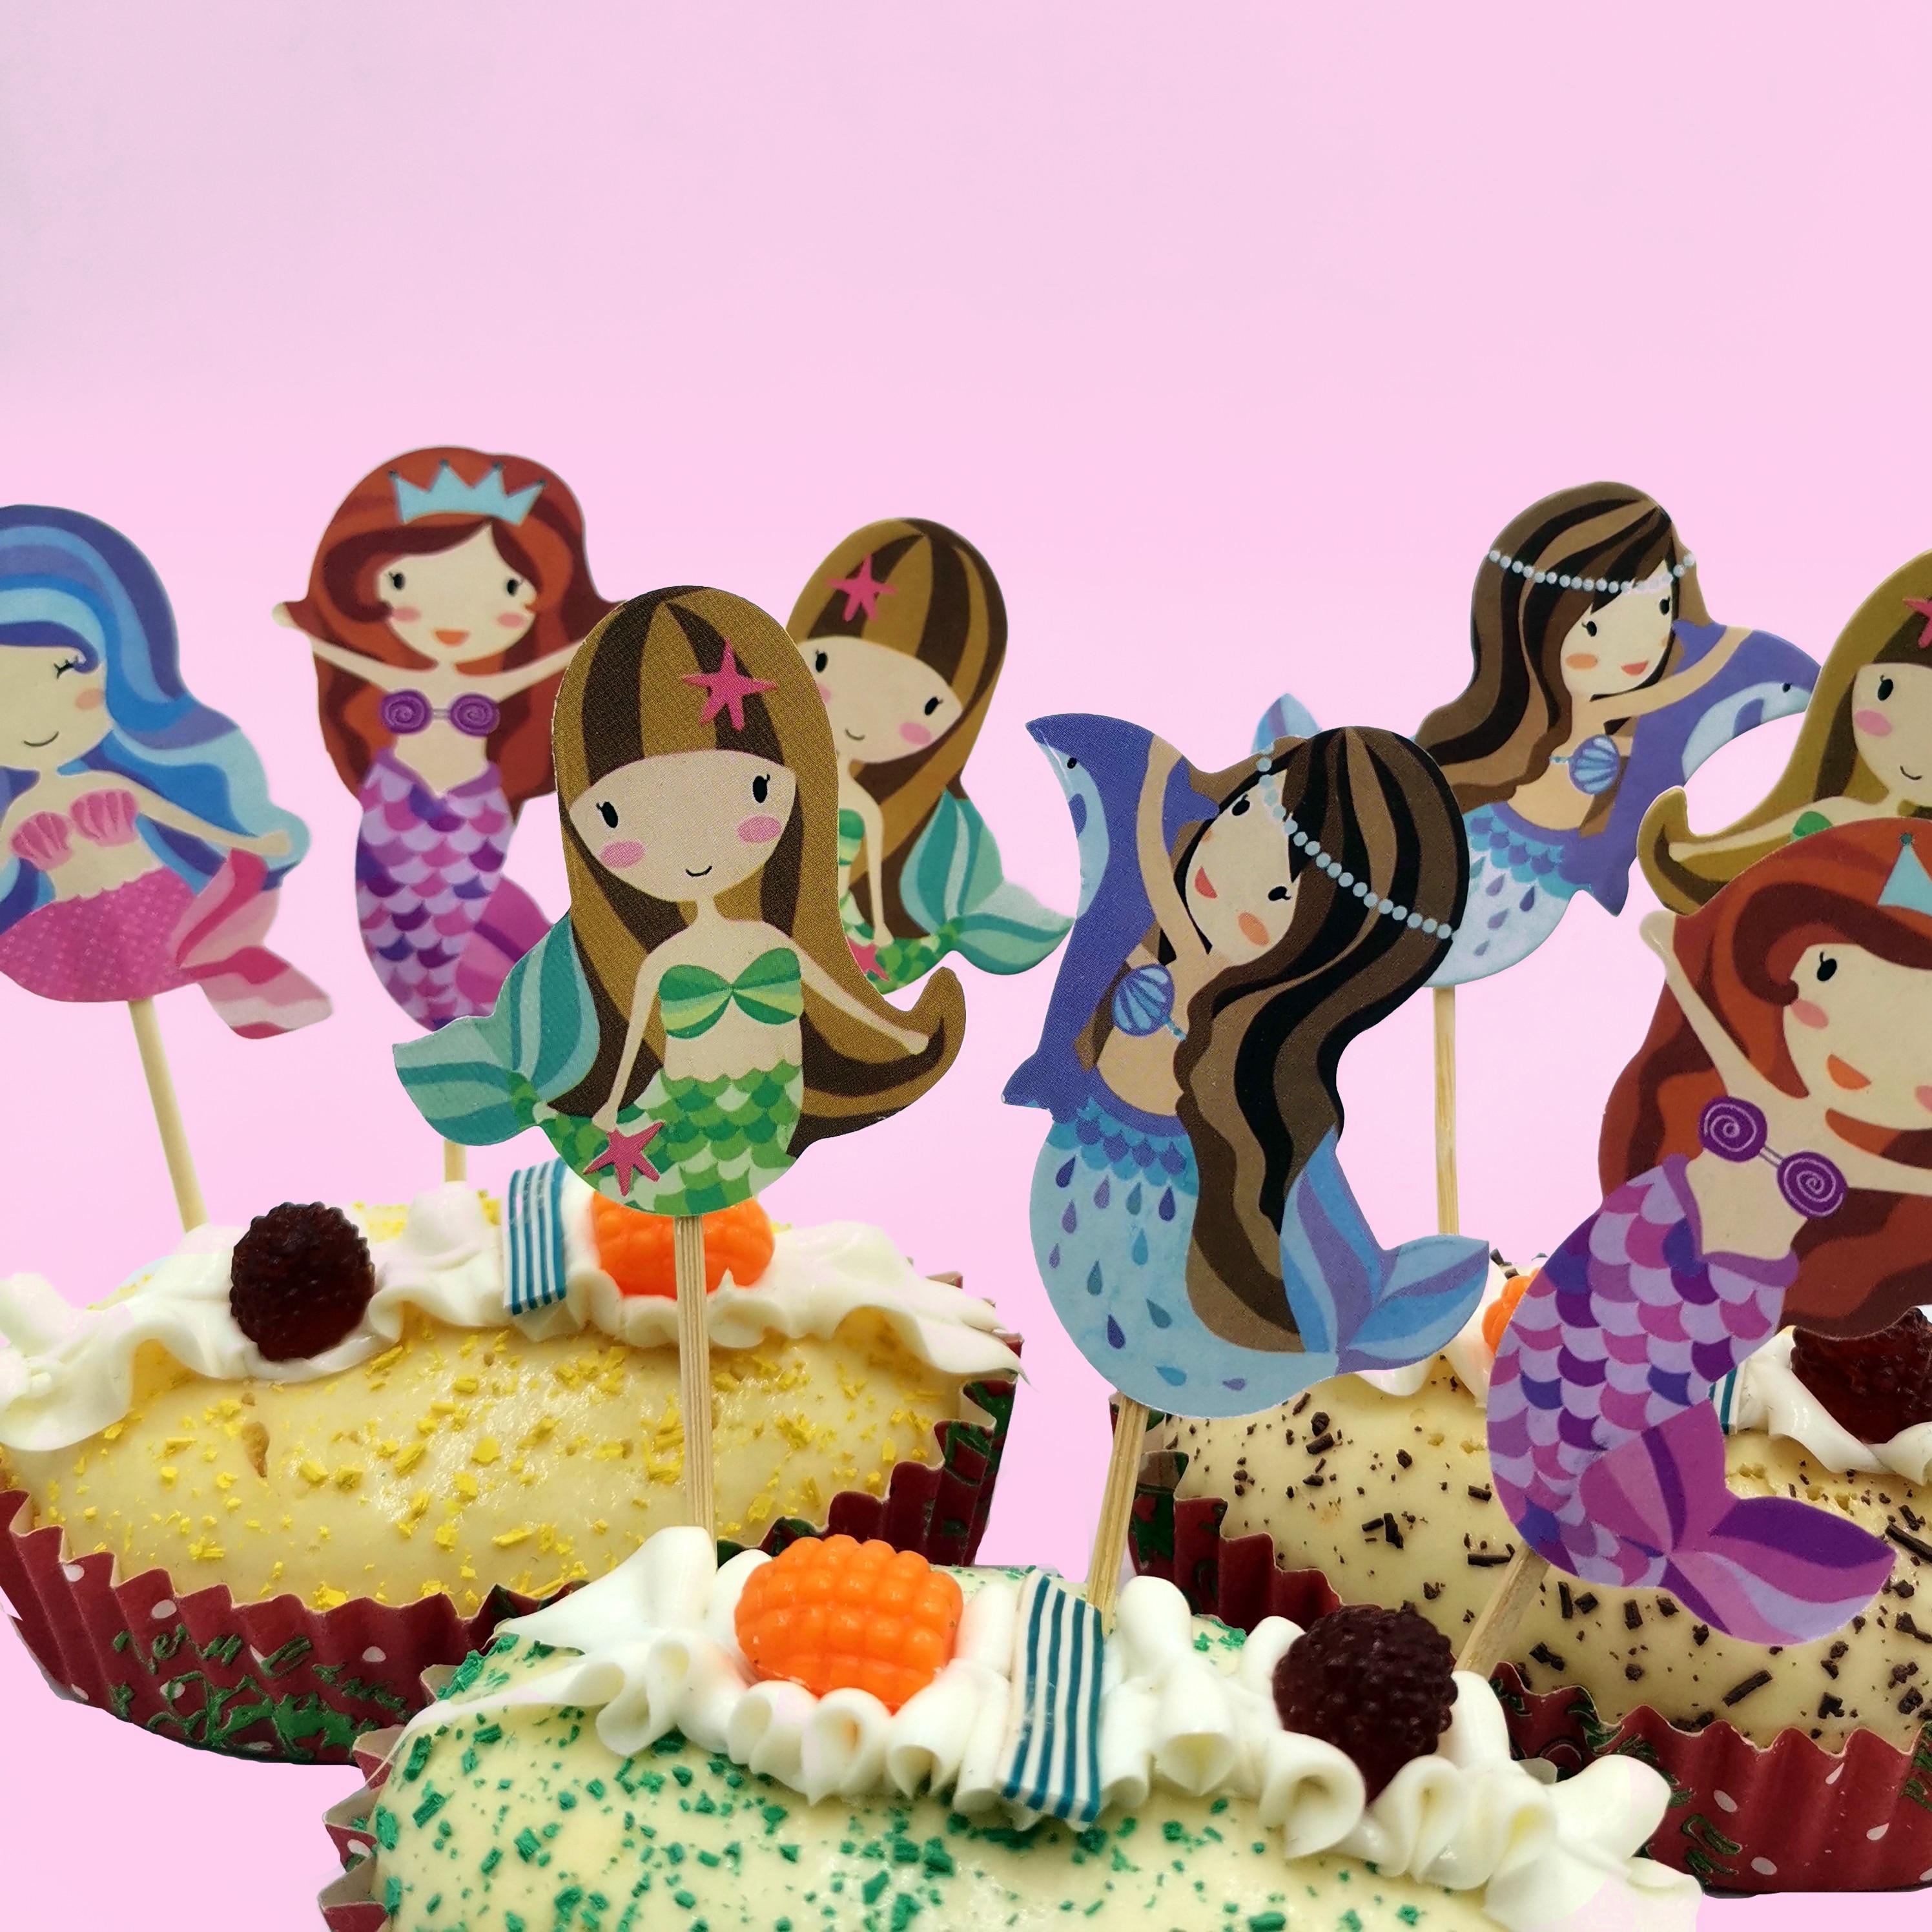 24pc Little Mermaid cake Toppers Kids Birthday Party supplies Baby Shower Kids Children Birthday Party Decorative Supplies in Cake Decorating Supplies from Home Garden